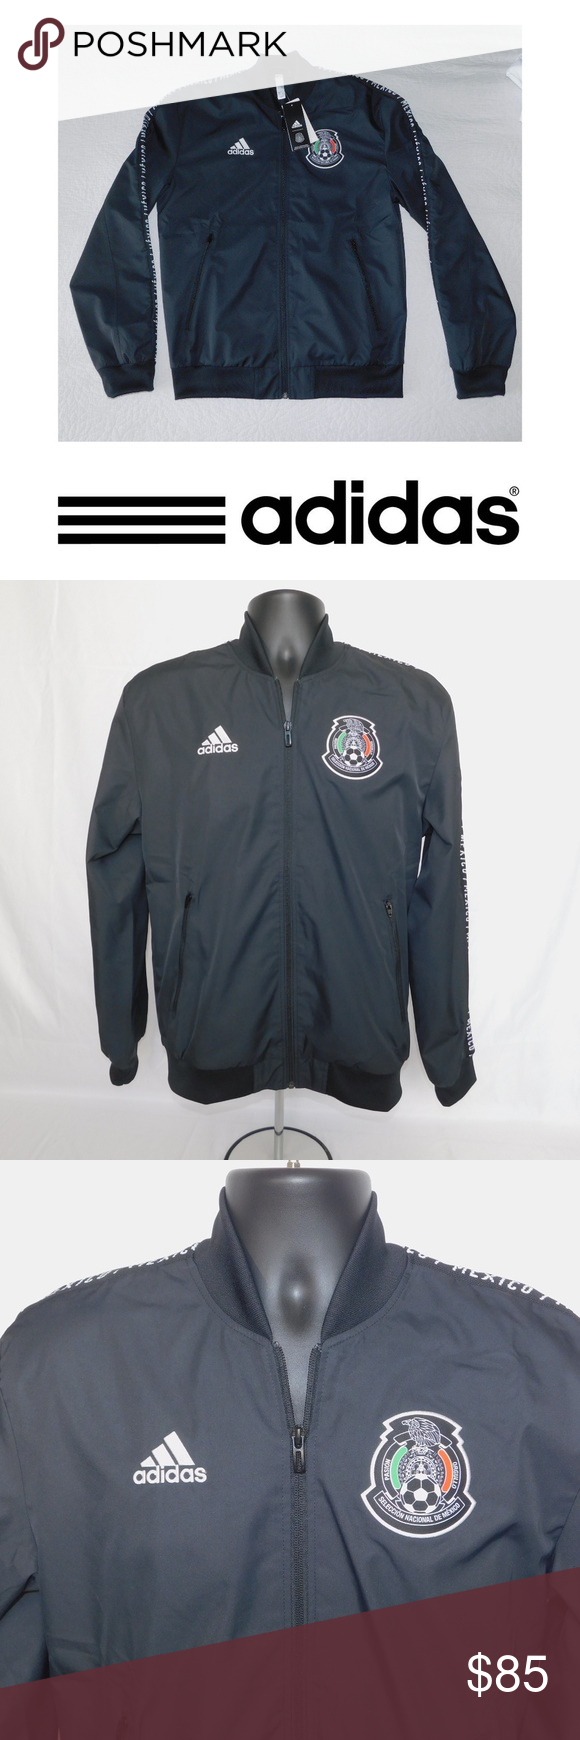 New Adidas Mexico National Team Jacket Our adidas Mexico